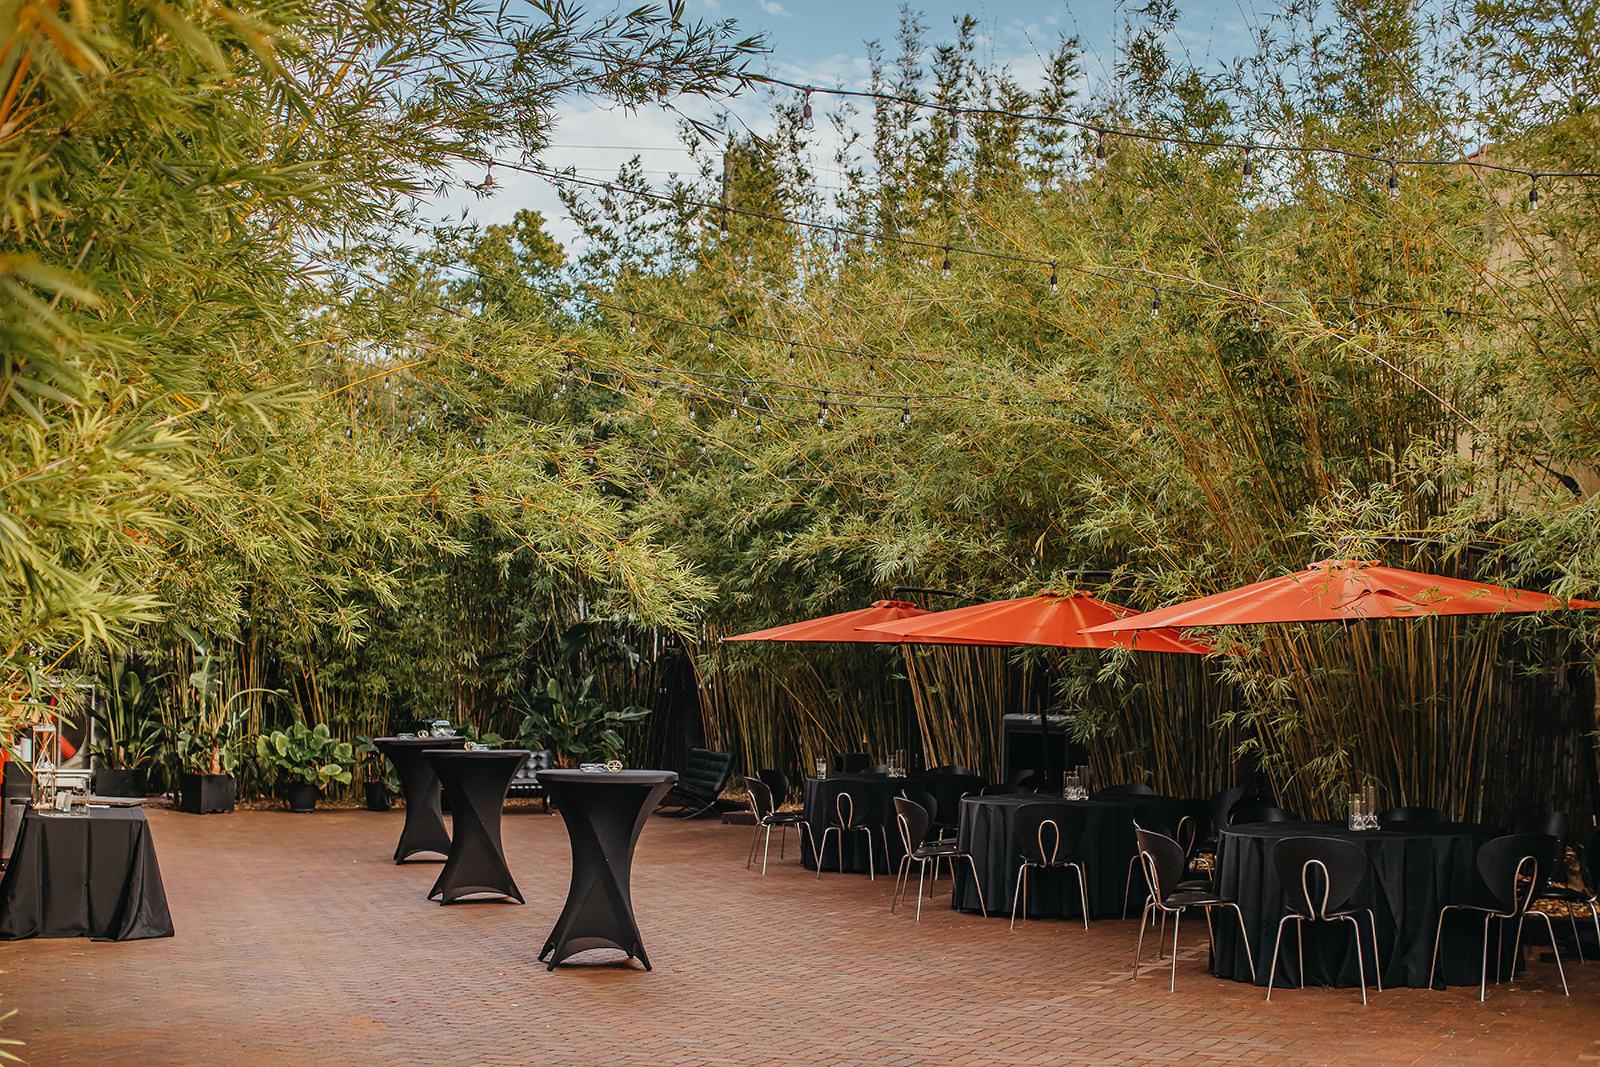 NOVA 535 | St. Pete Wedding Venue Outdoor Courtyard